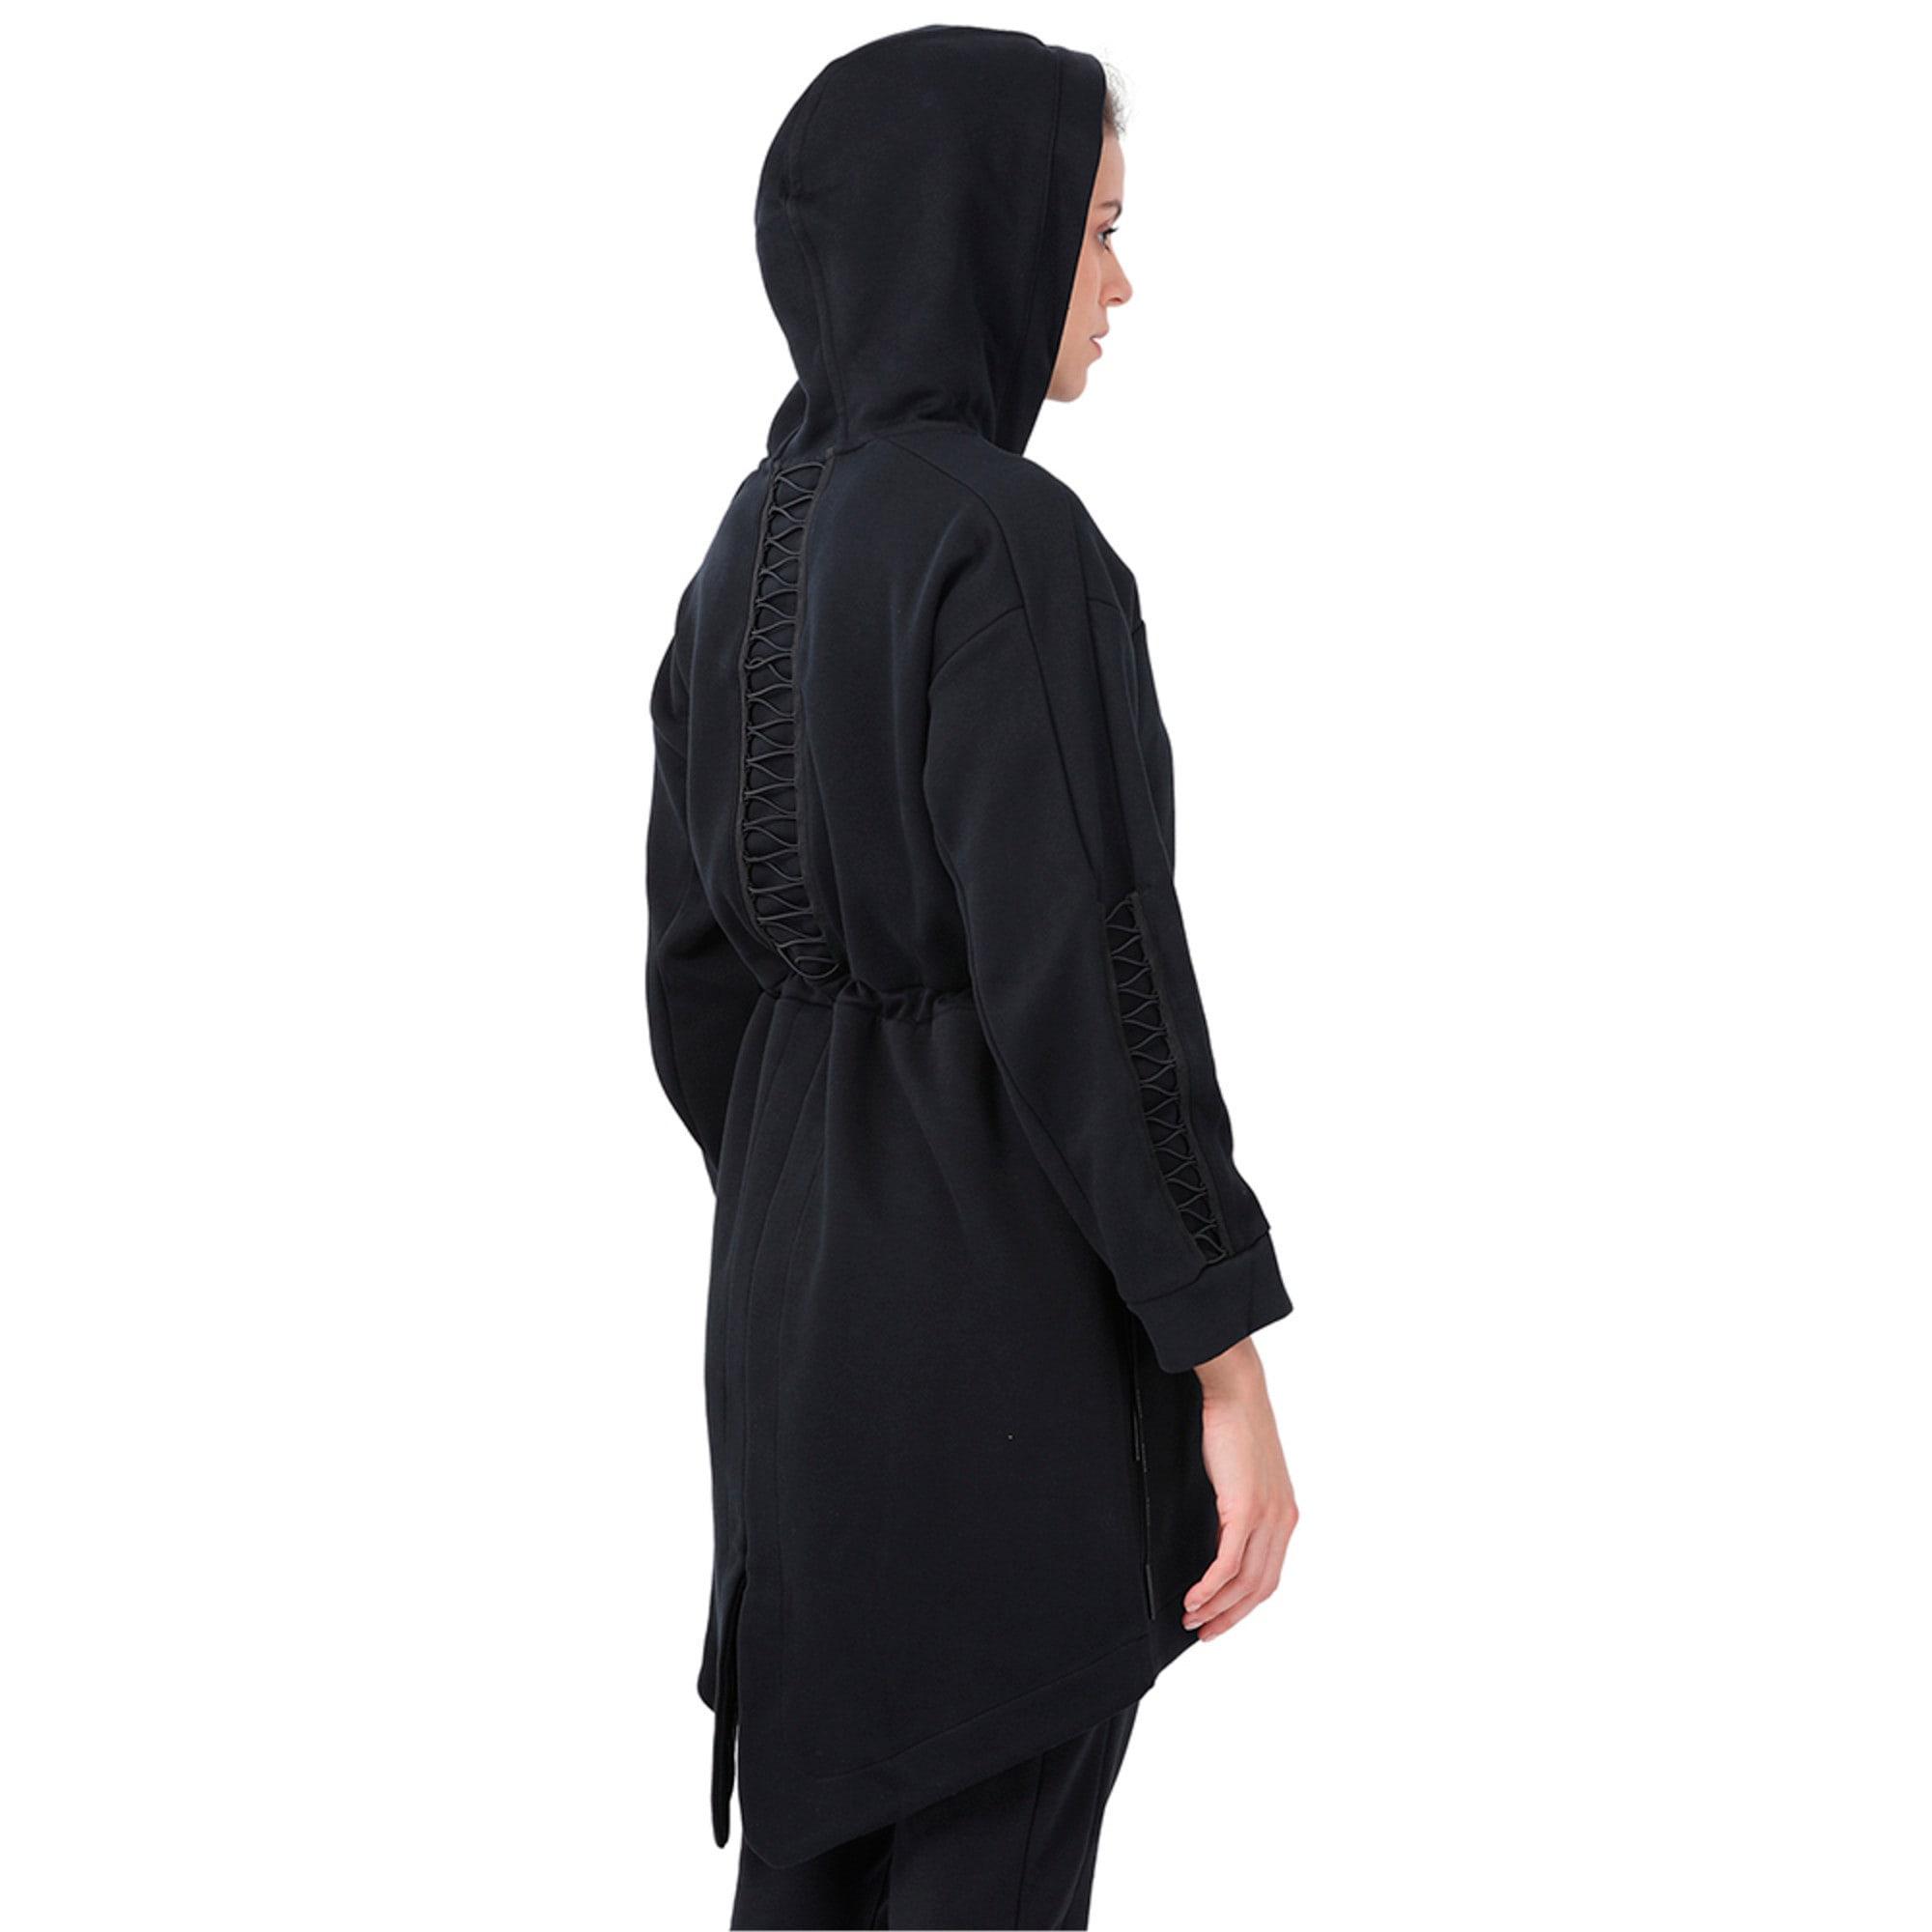 Thumbnail 3 of Evolution Women's Lacing Midlayer Jacket, Puma Black, medium-IND